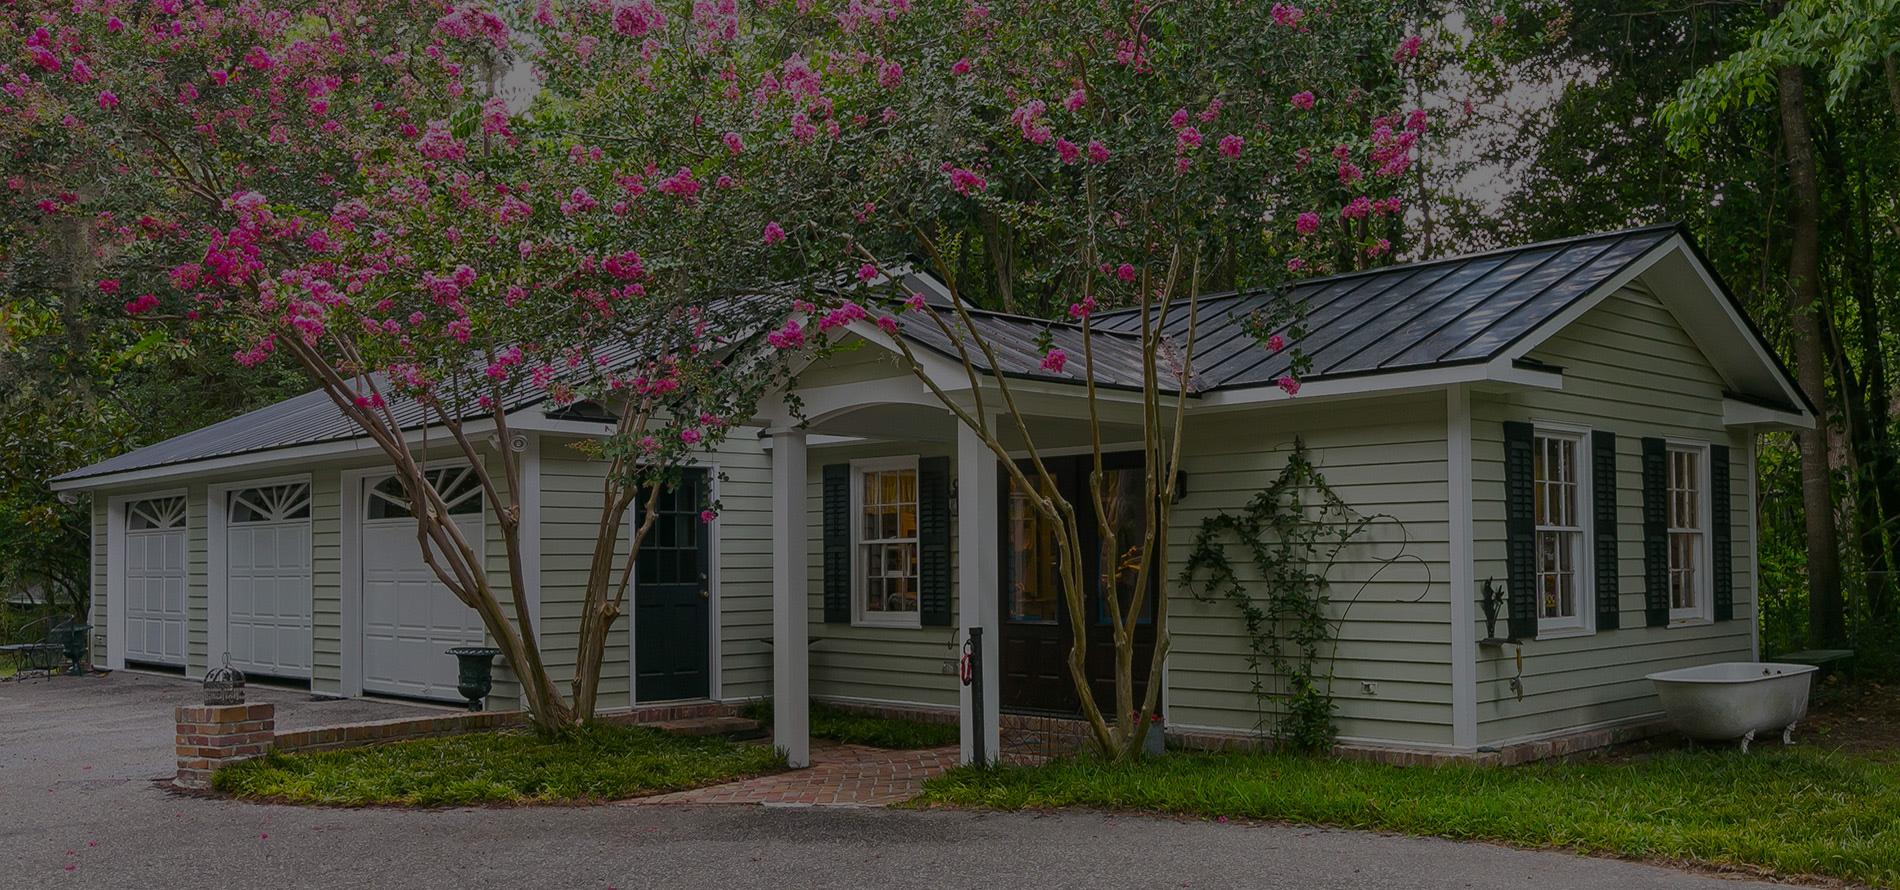 Home Remodel Mountpleasant Carolina Hmp O